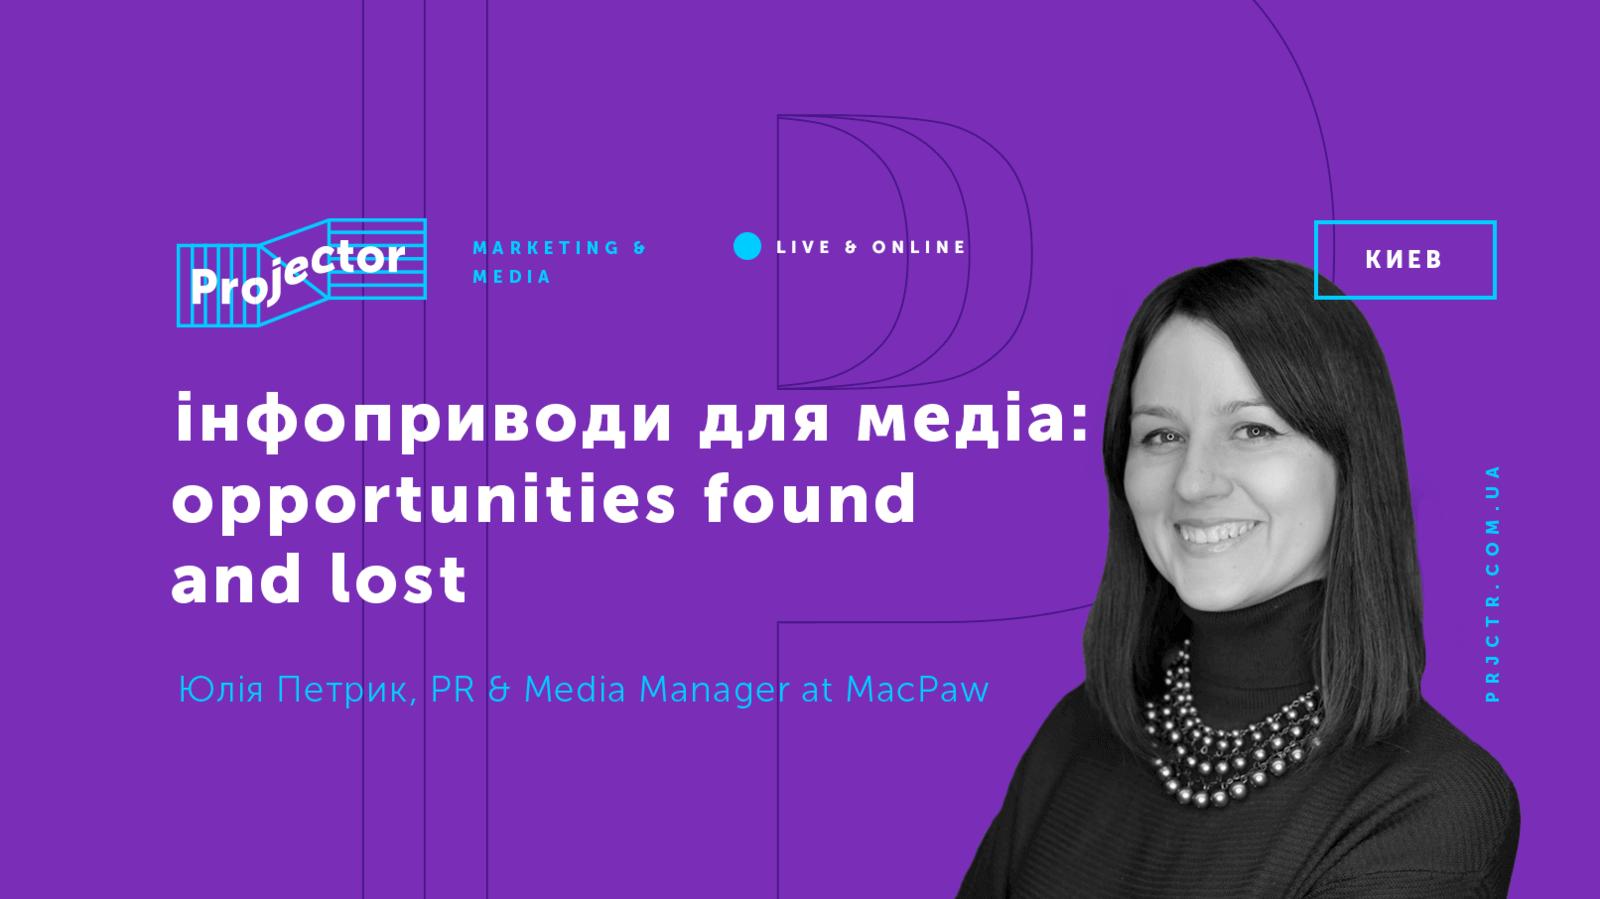 Інфоприводи для медіа: opportunities found and lost